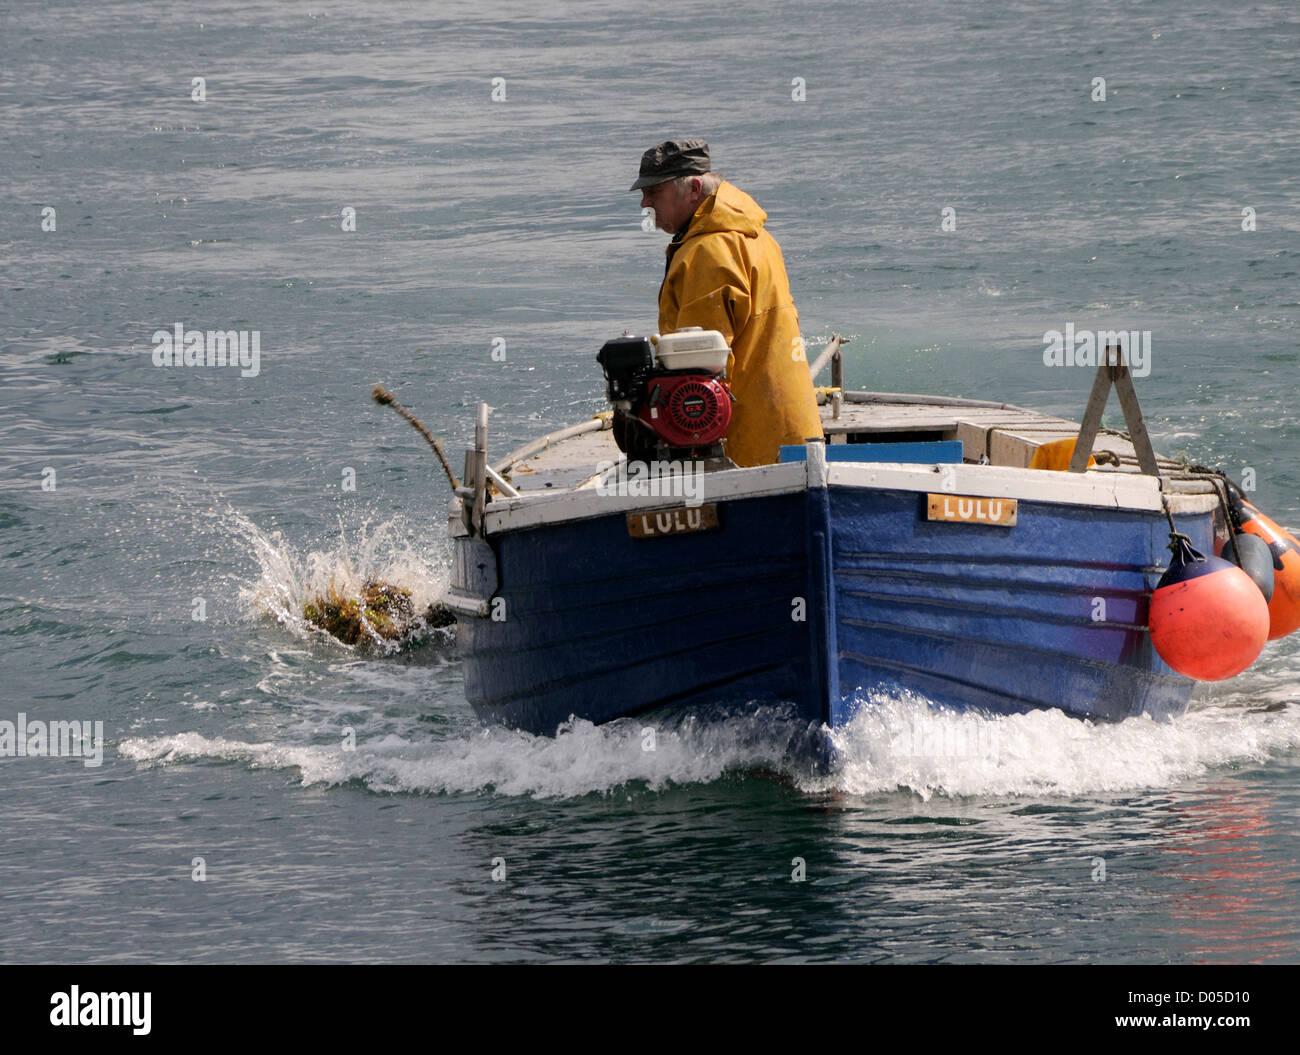 A crab fisherman drops his last pot. Scrabster, Caithness, Scotland, UK. - Stock Image